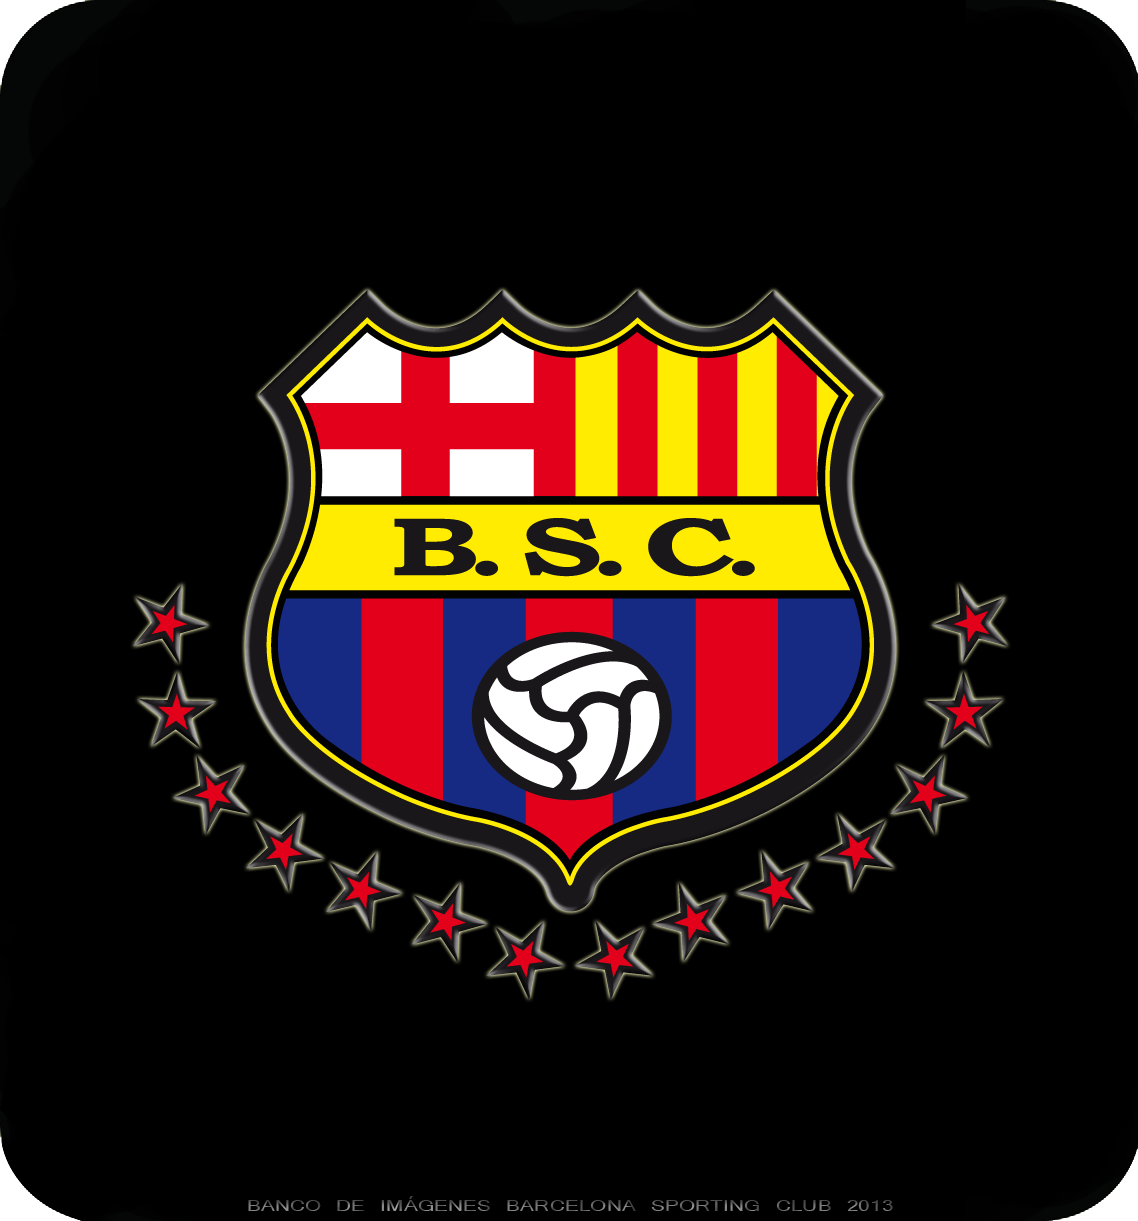 BARCELONA SPORTING CLUB IDOLO DEL ECUADOR